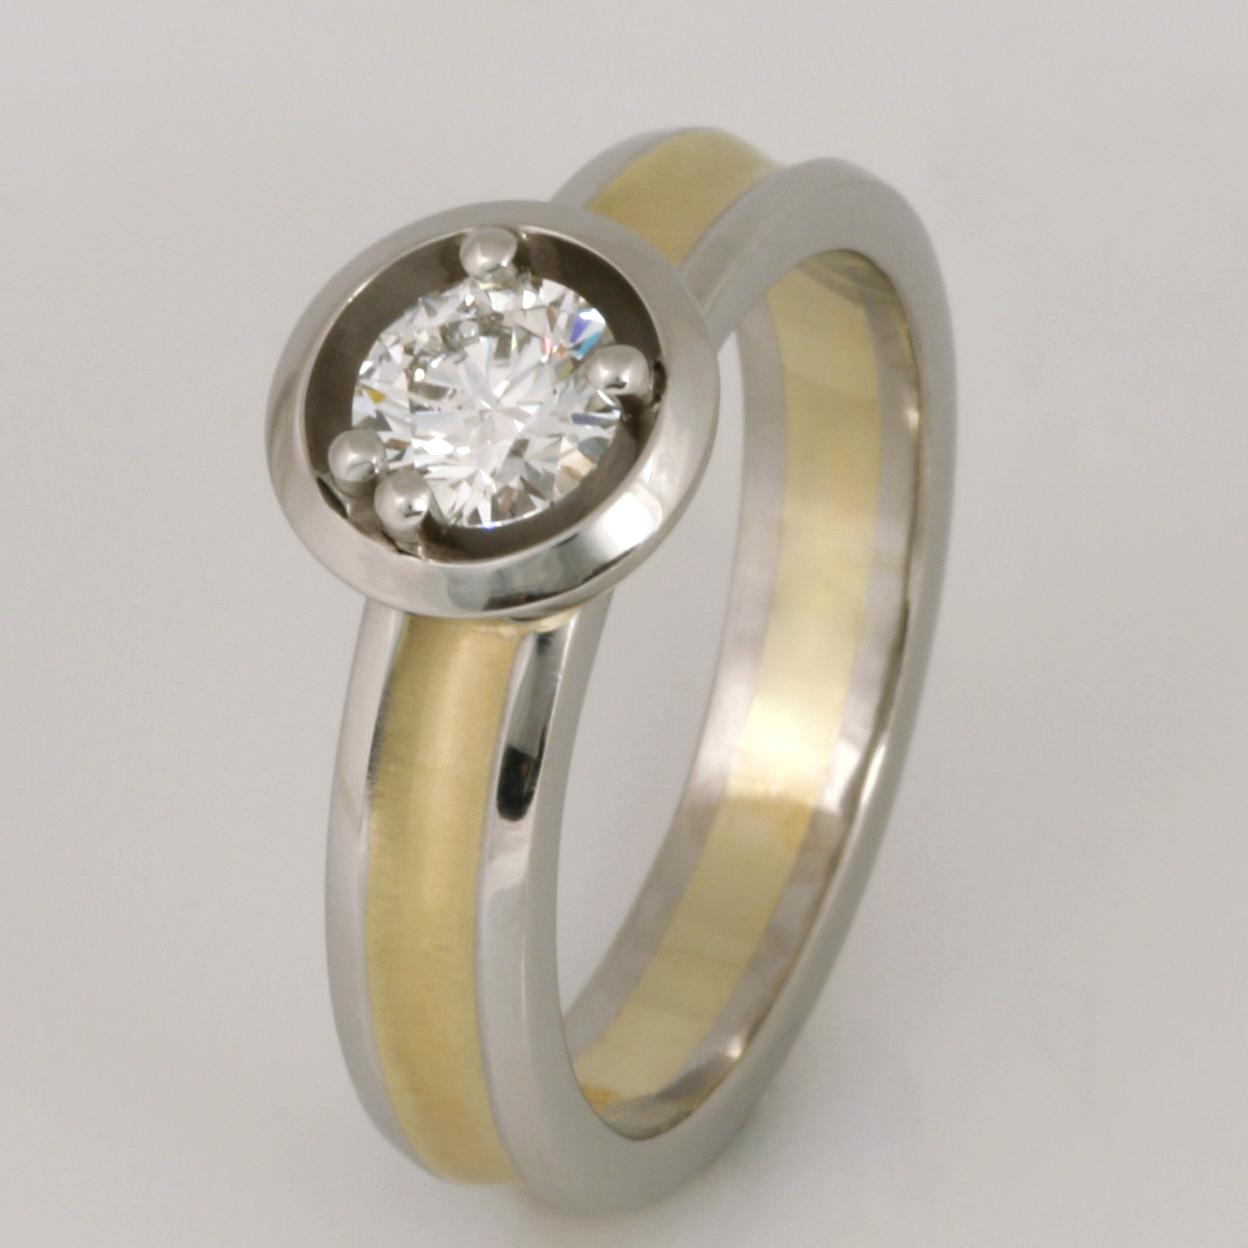 Handmade ladies palladium and 18ct green gold diamond ring